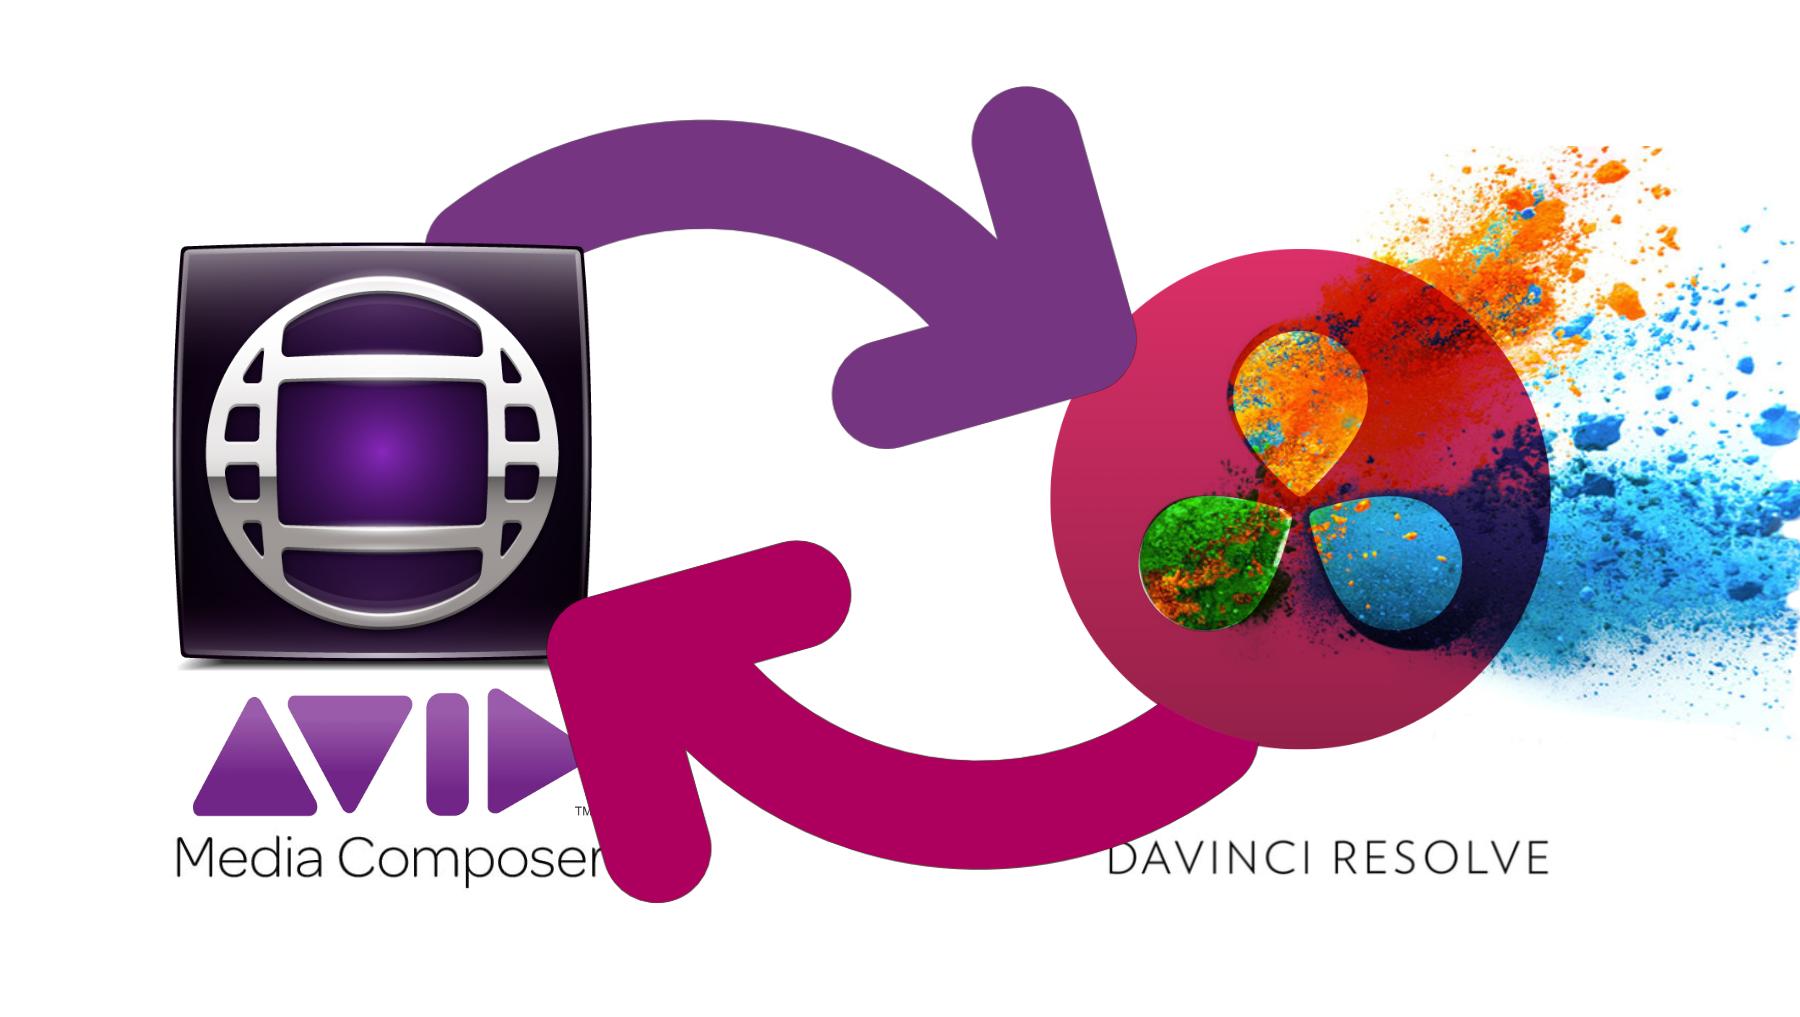 AVID Media Composer & DaVinci Resolve roundtrip – Obsessive Coffee